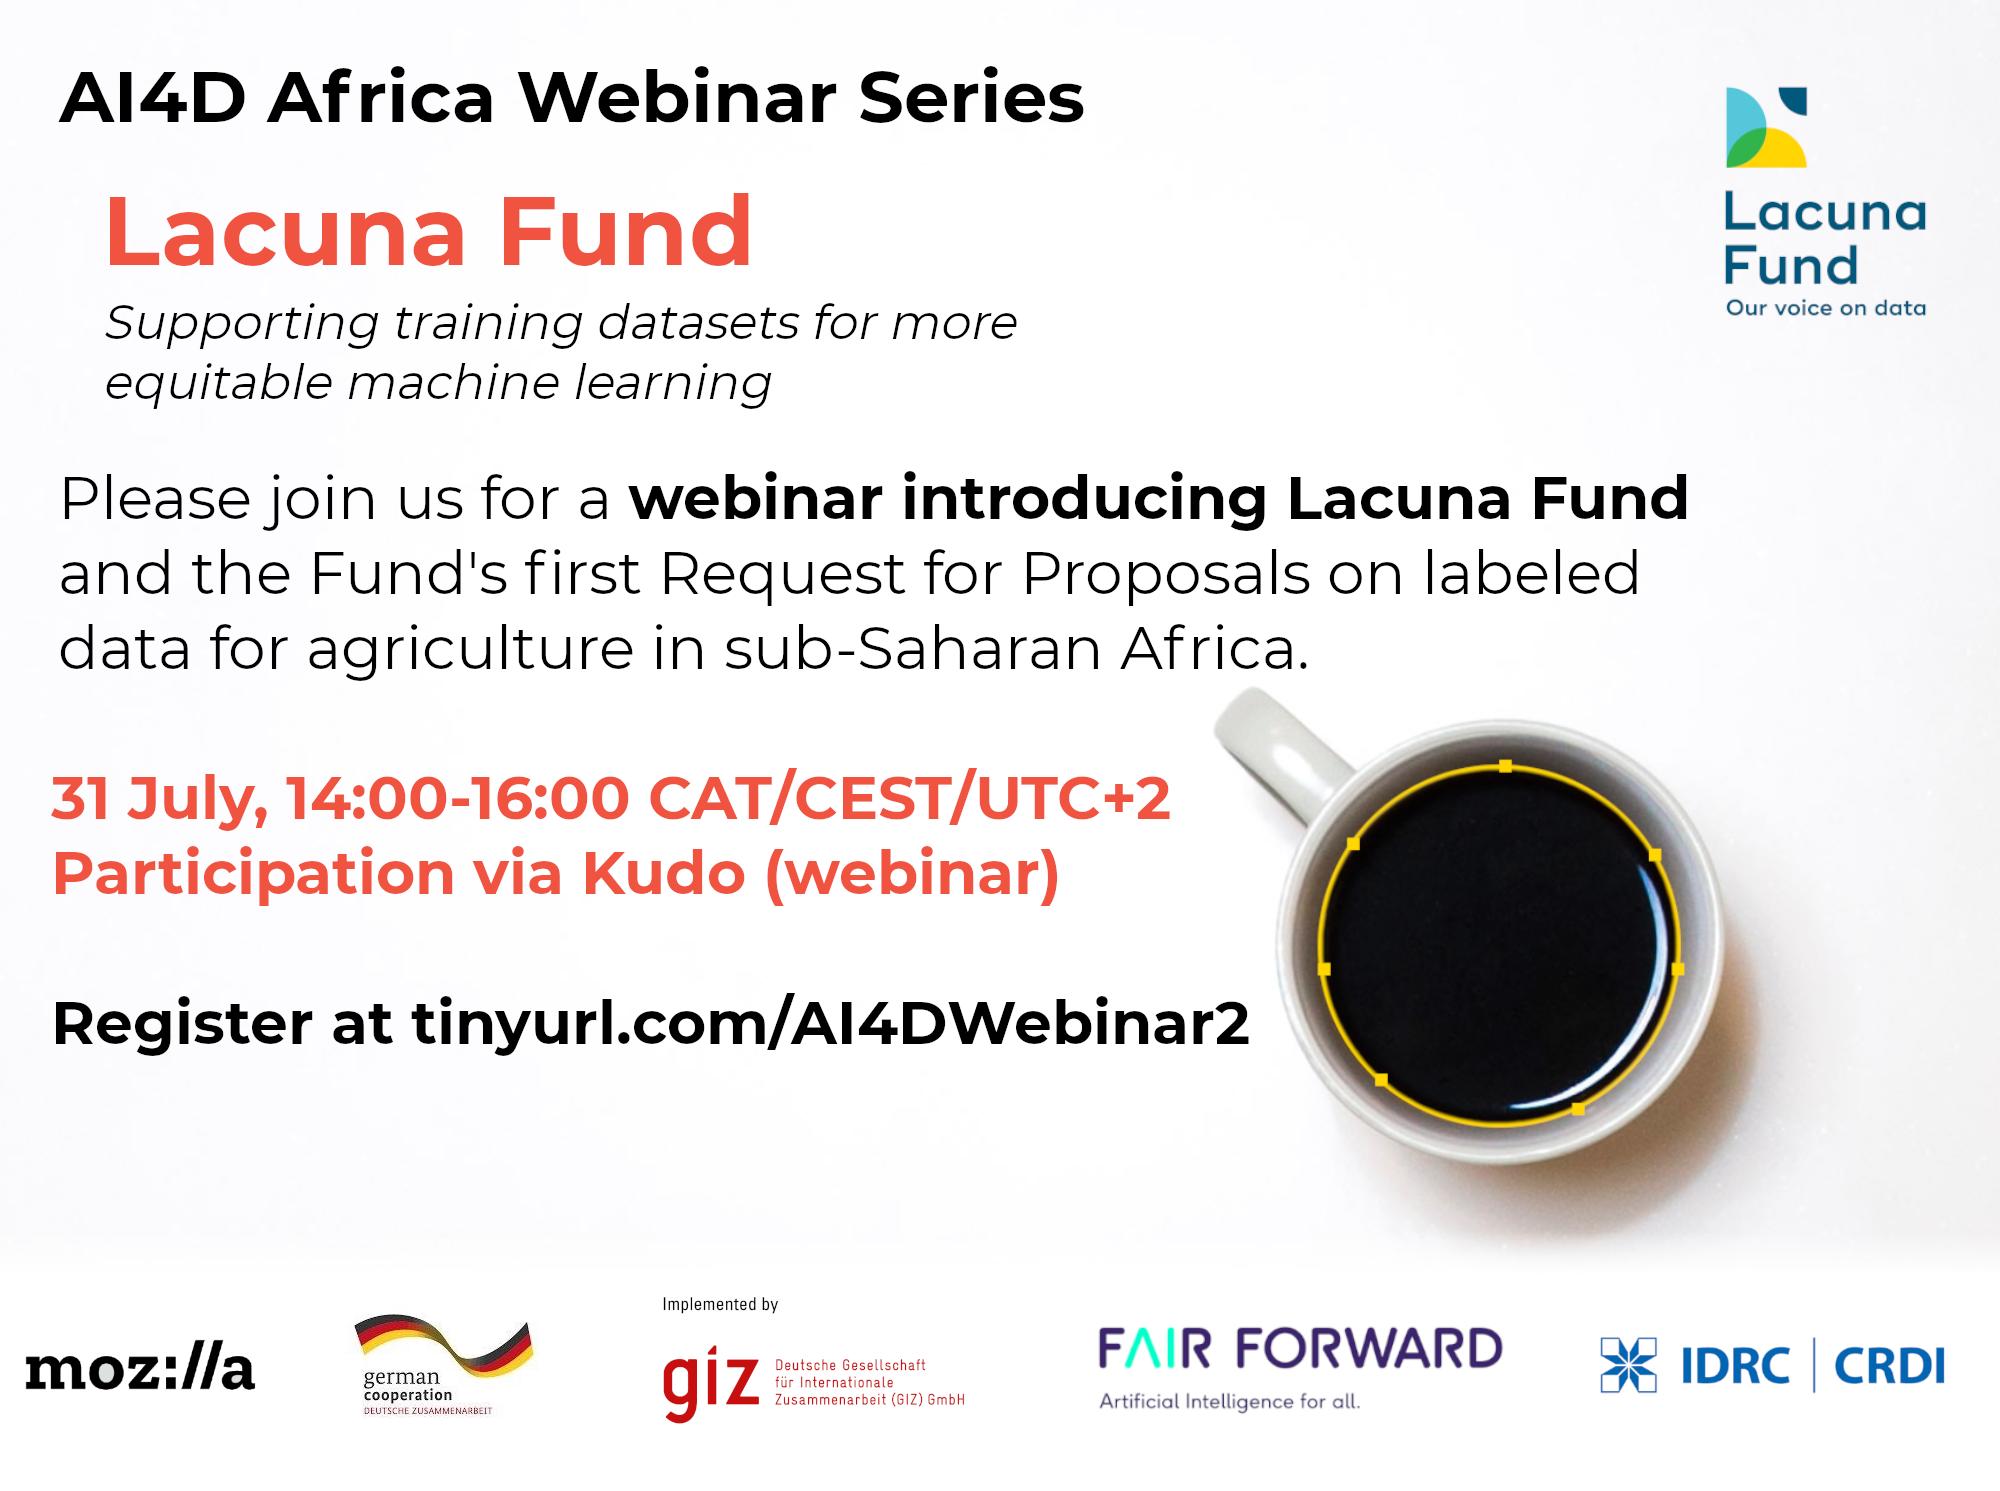 Join AI4D, Mozilla, and GIZ's FAIR Forward initiative for a webinar with the Lacuna Fund Secretariat